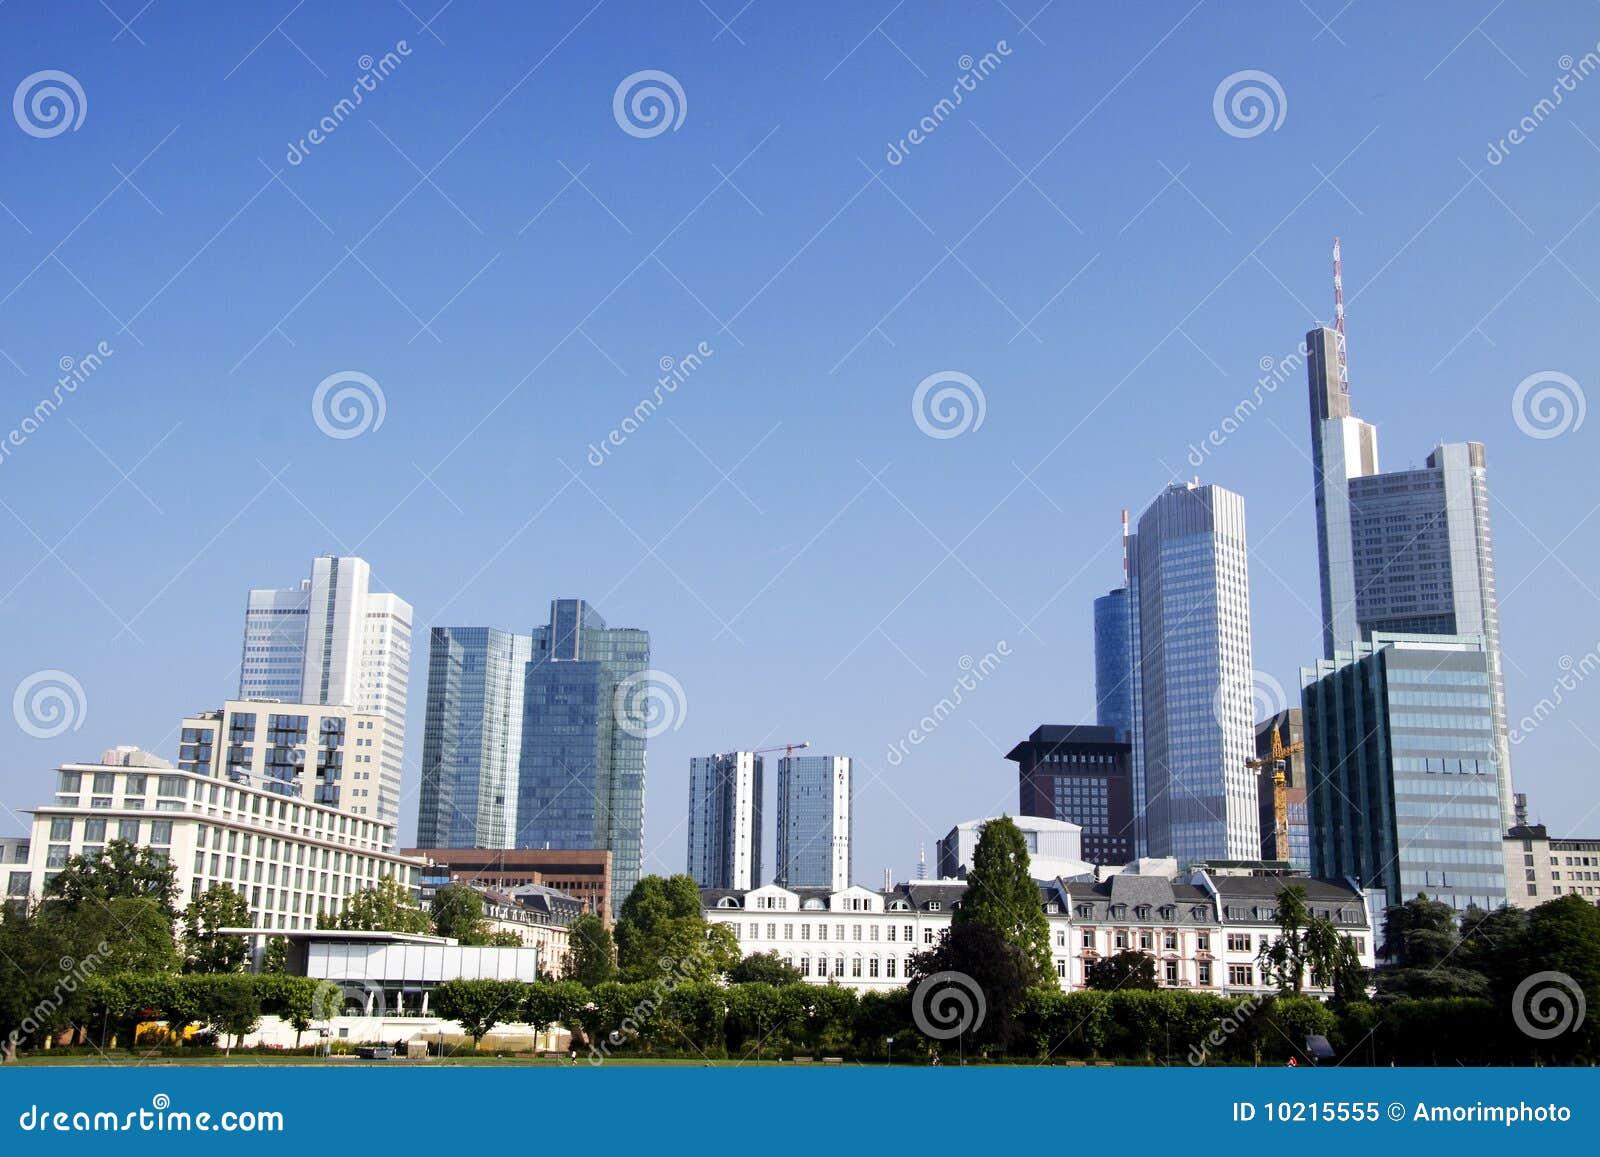 The banks of Frankfurt